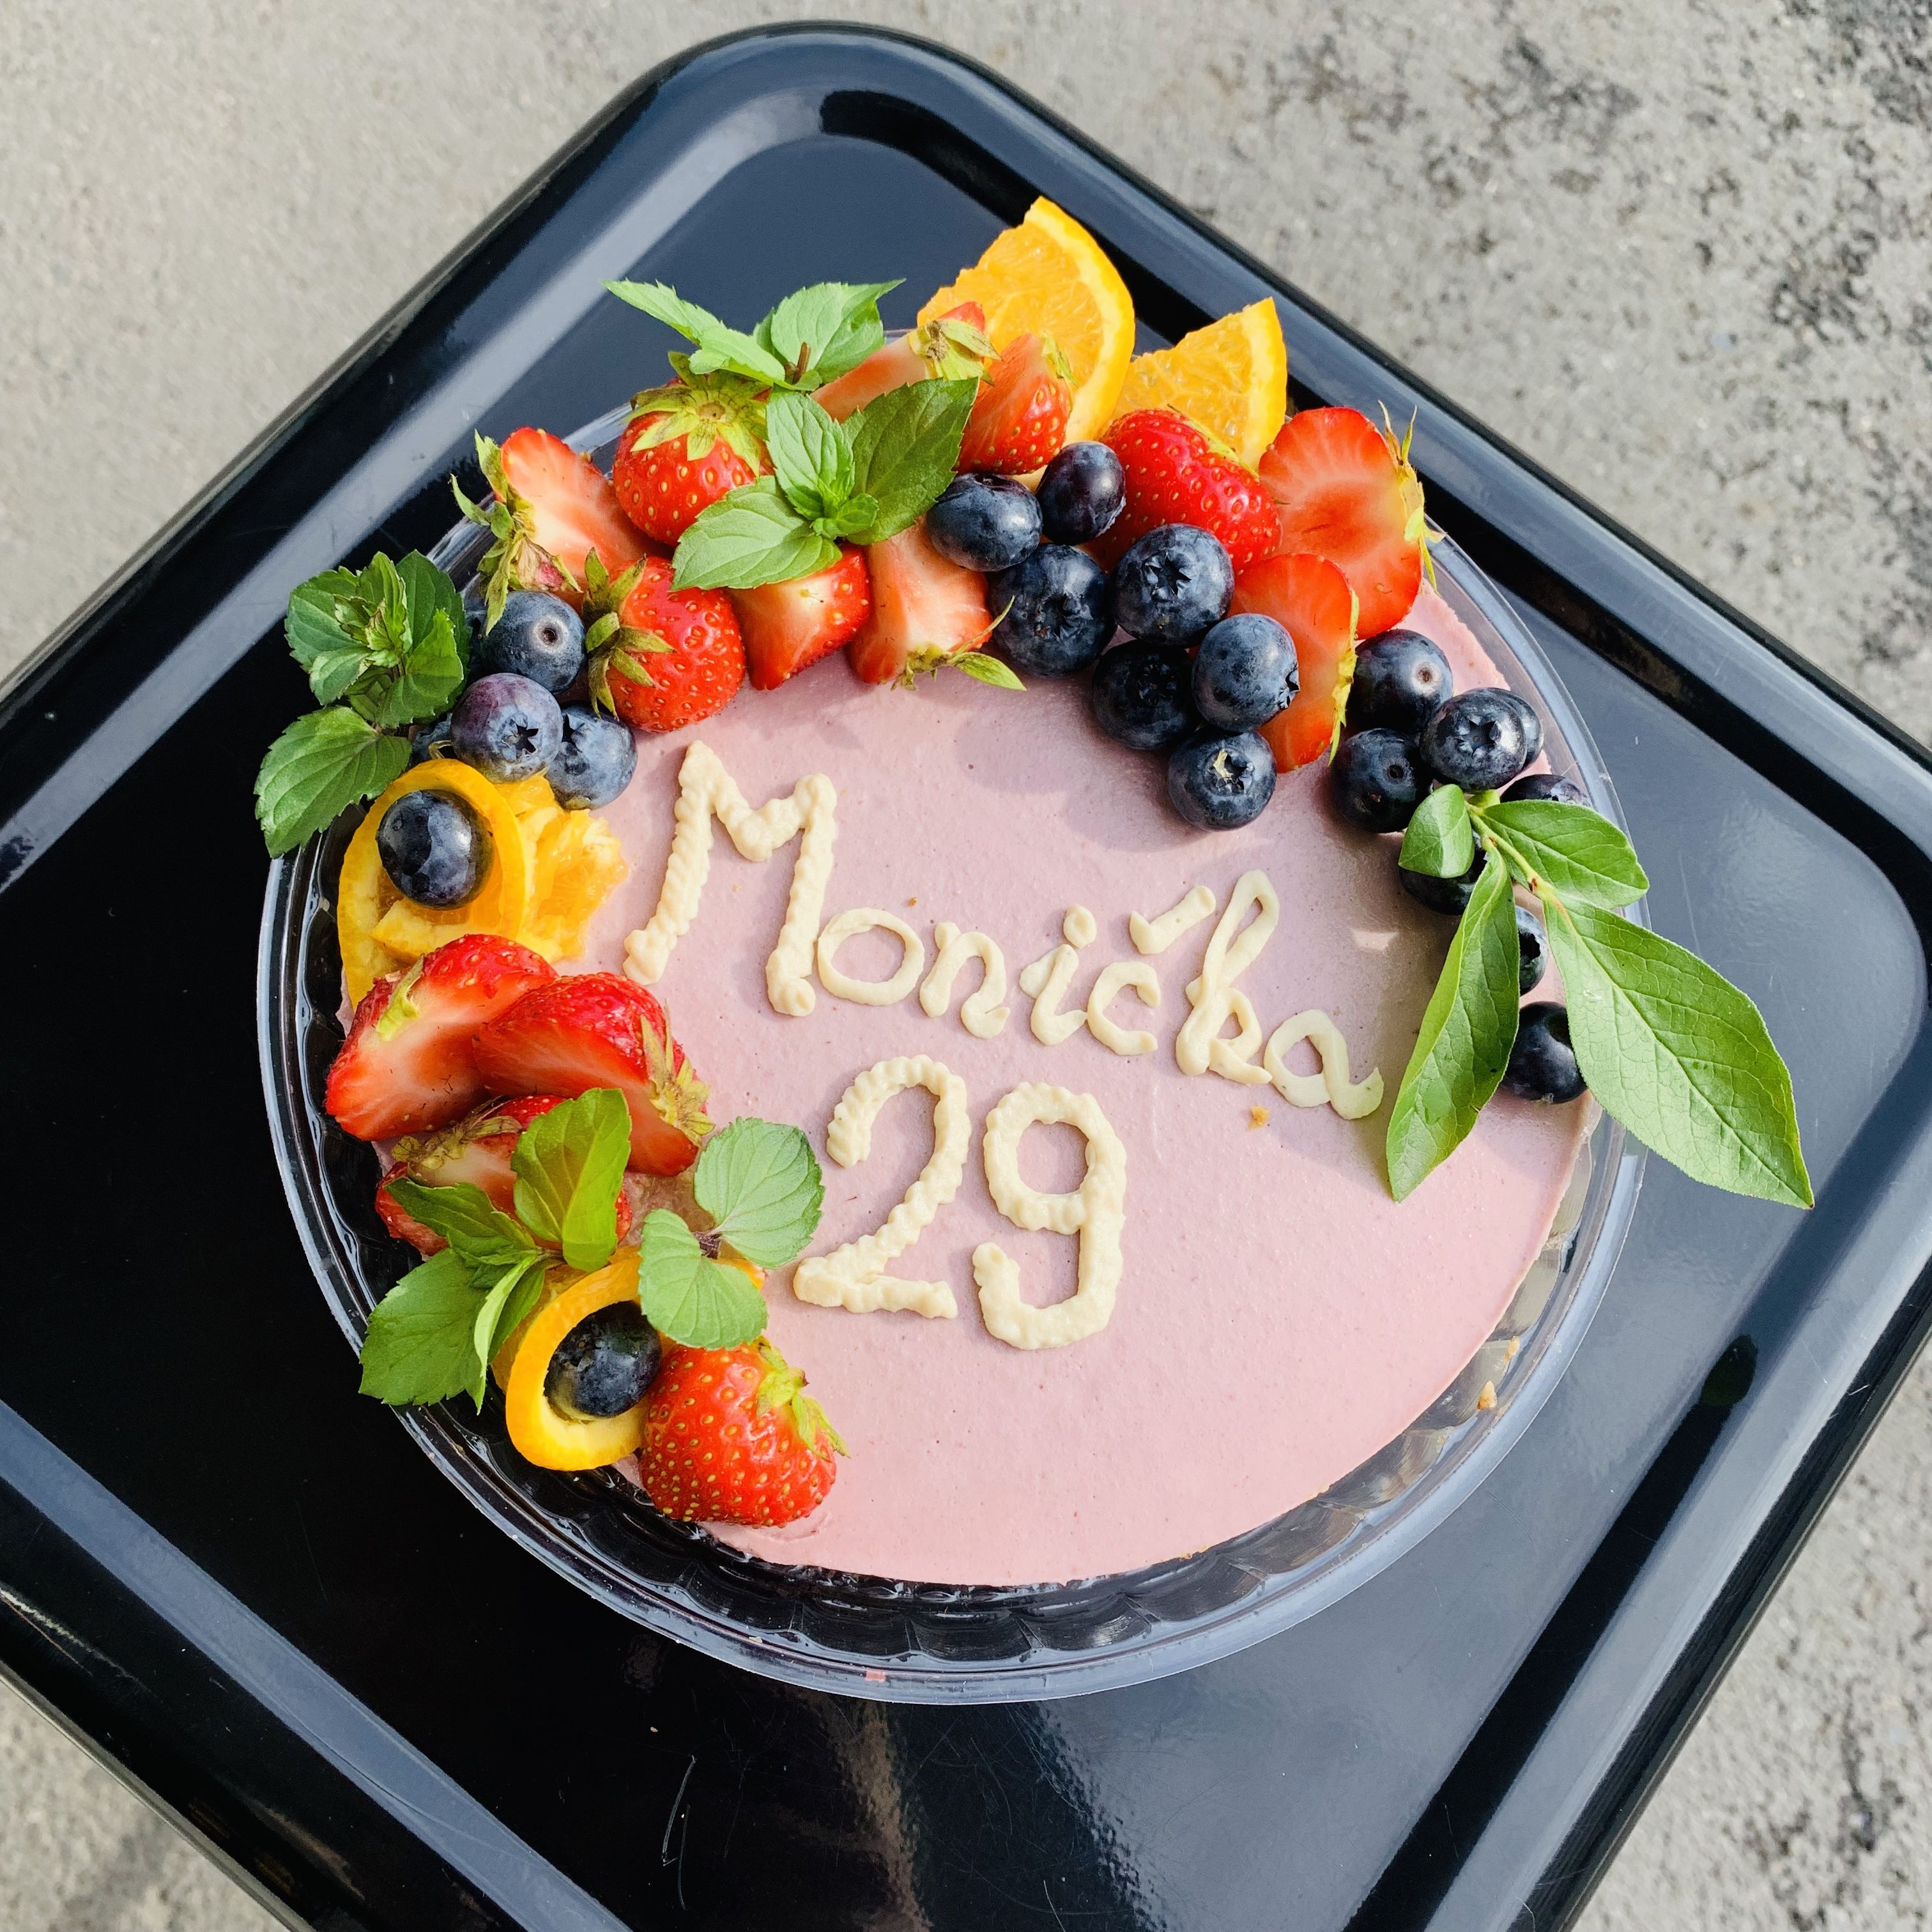 krásný dortík k narozeninám. Monička - Ostrava